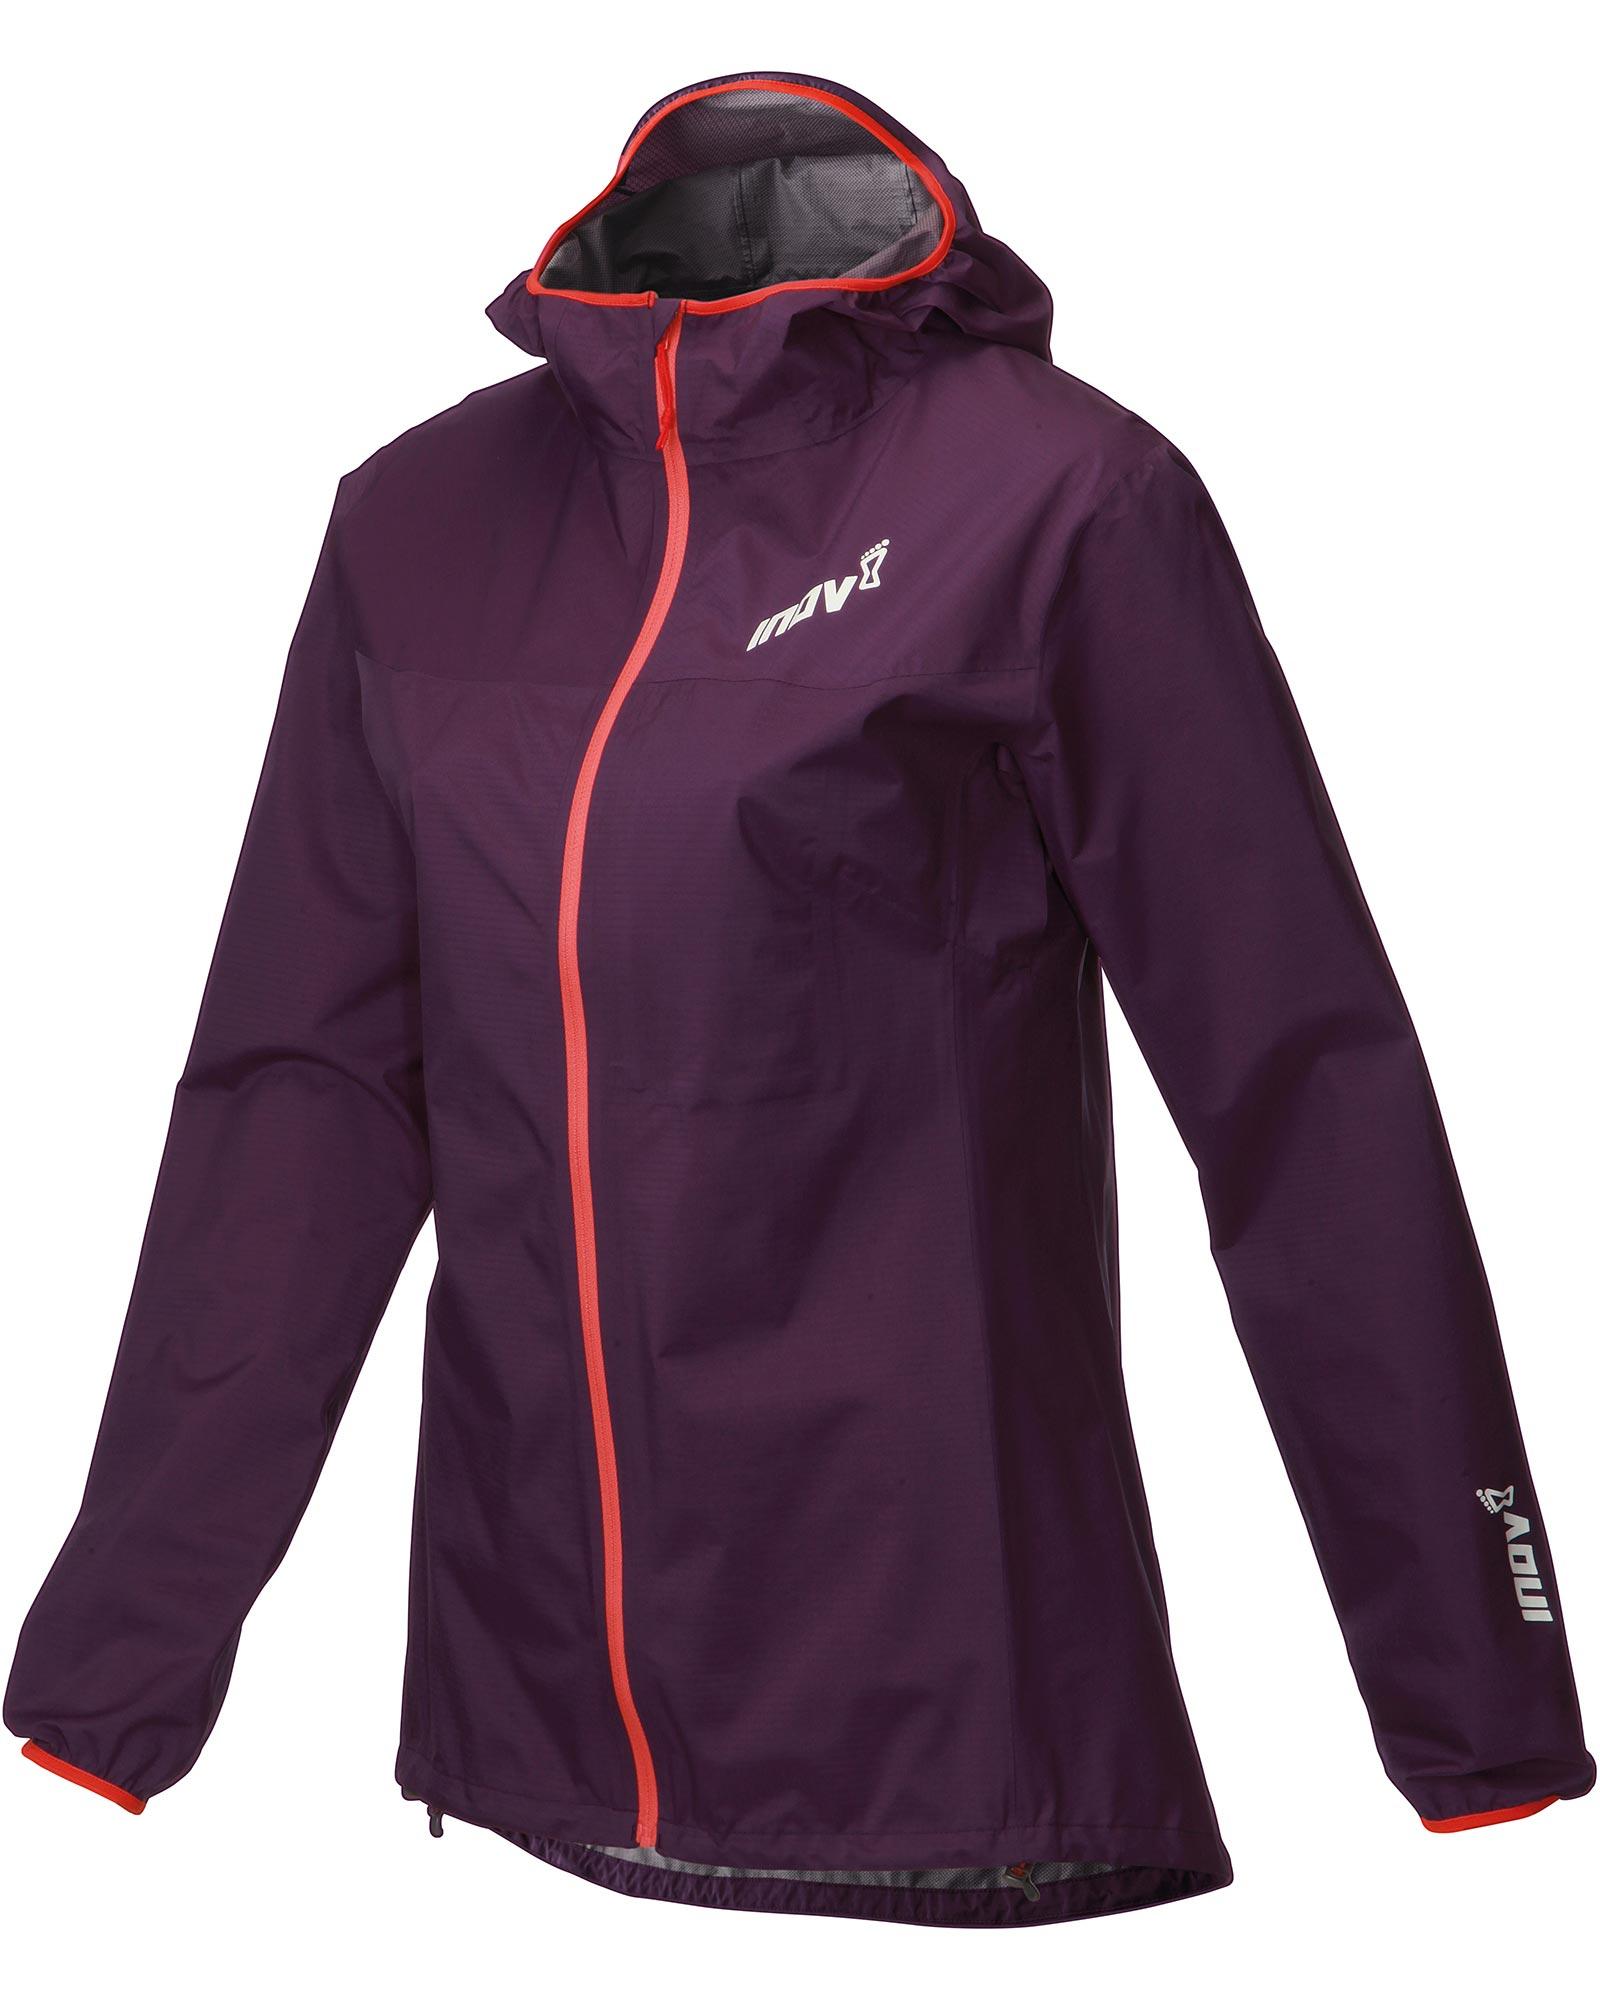 Inov-8 Women's FZ Trailshell Pertex Shield Jacket 0